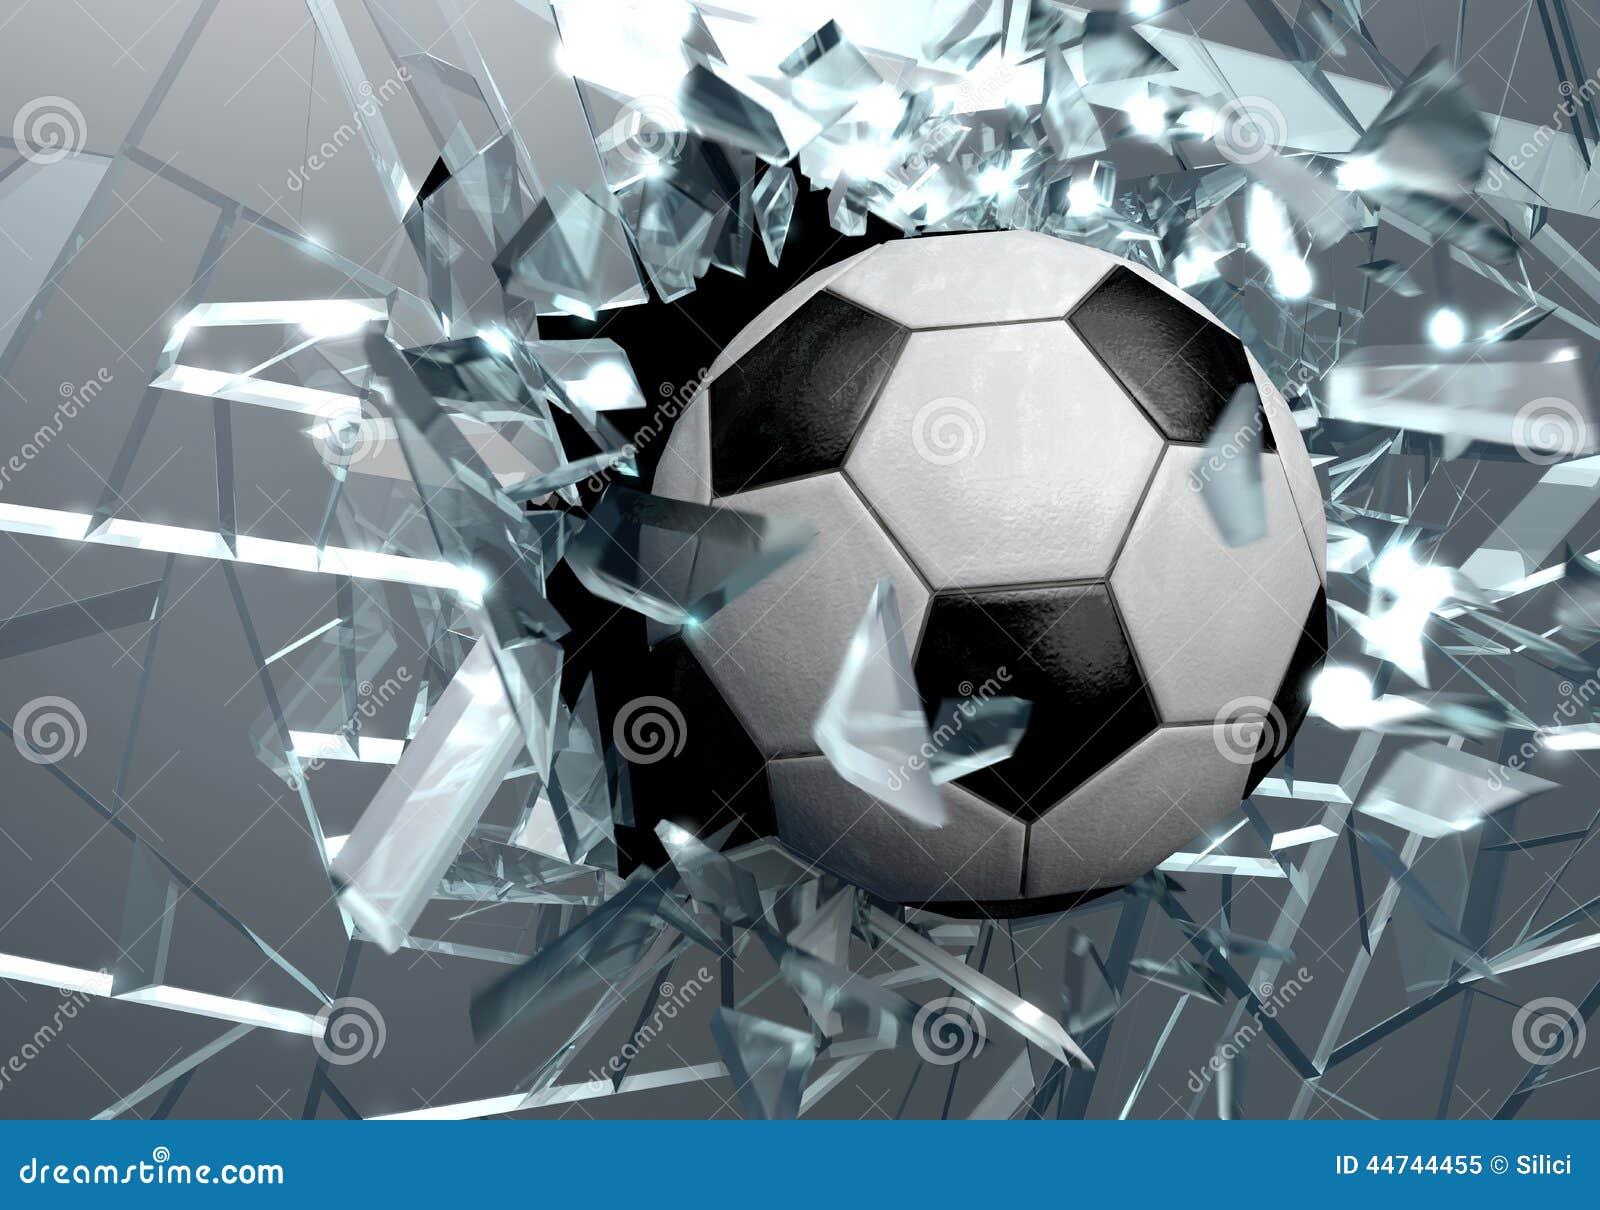 Broken glass 3d soccer ball stock illustration image for 3 dimensional drawing software